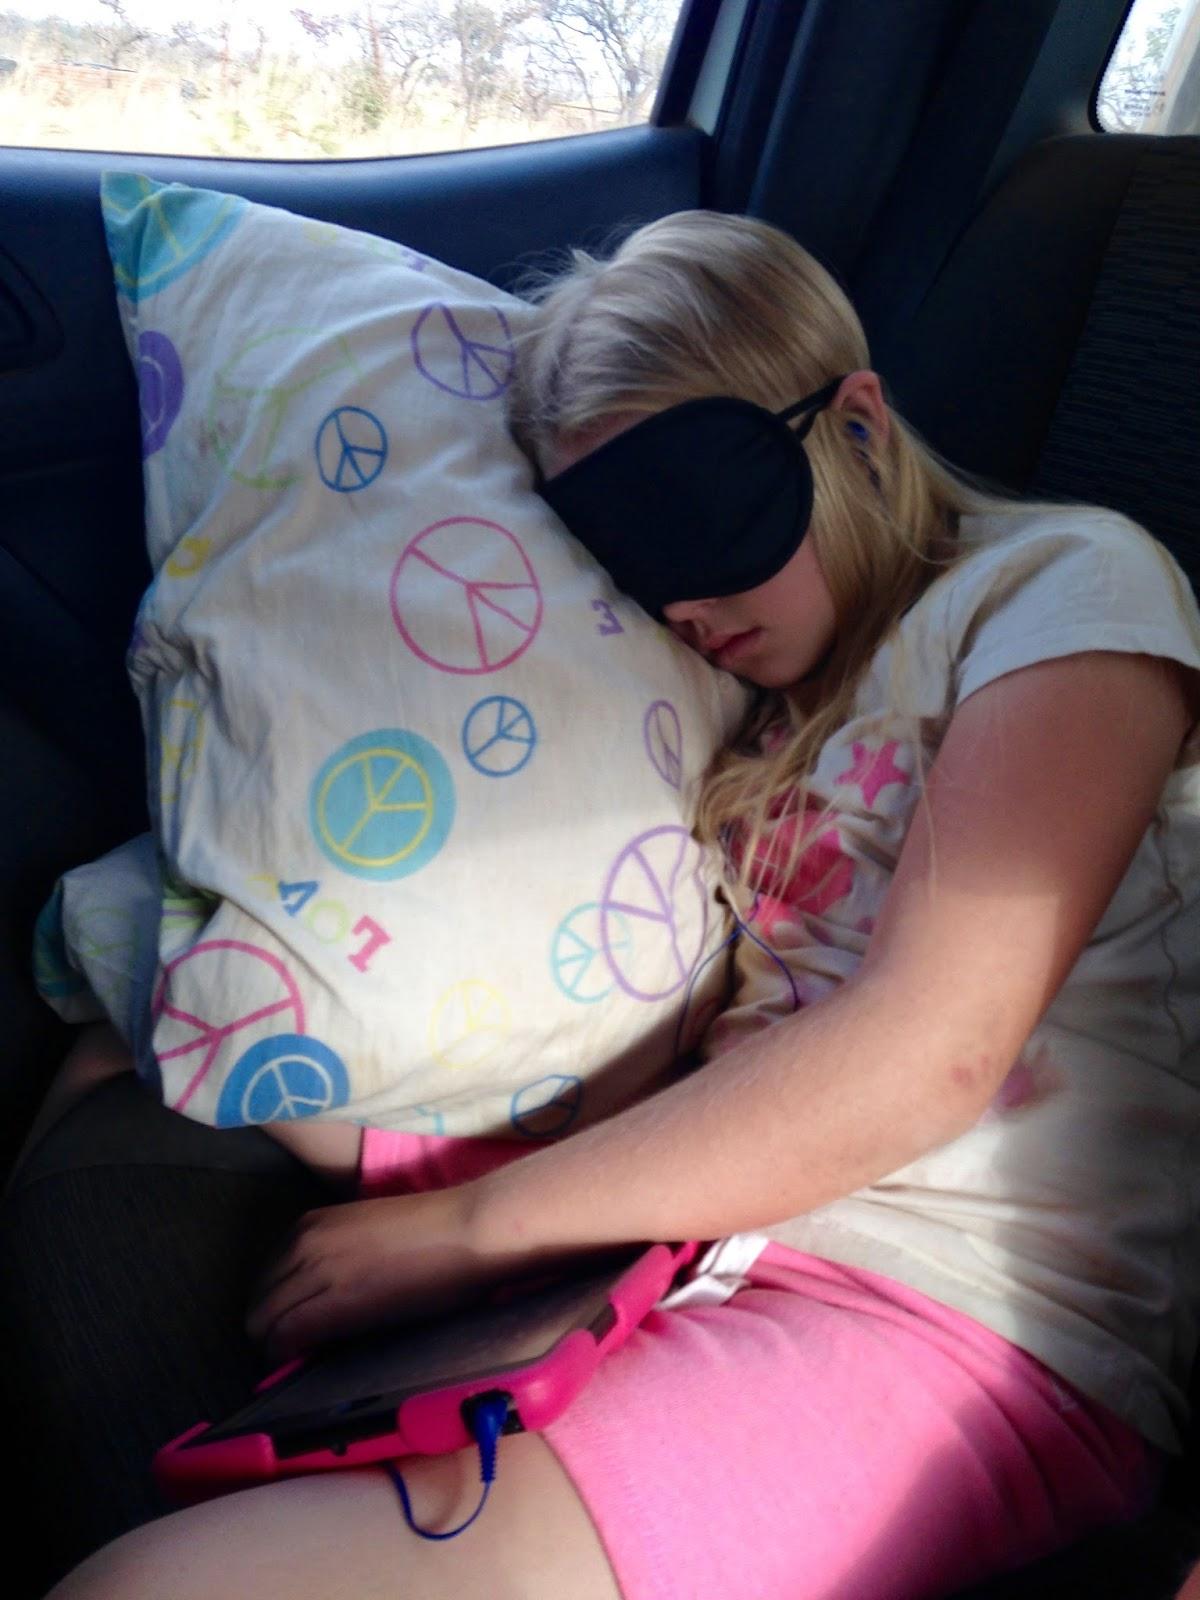 People porn min backseat sleeping teen lesbo